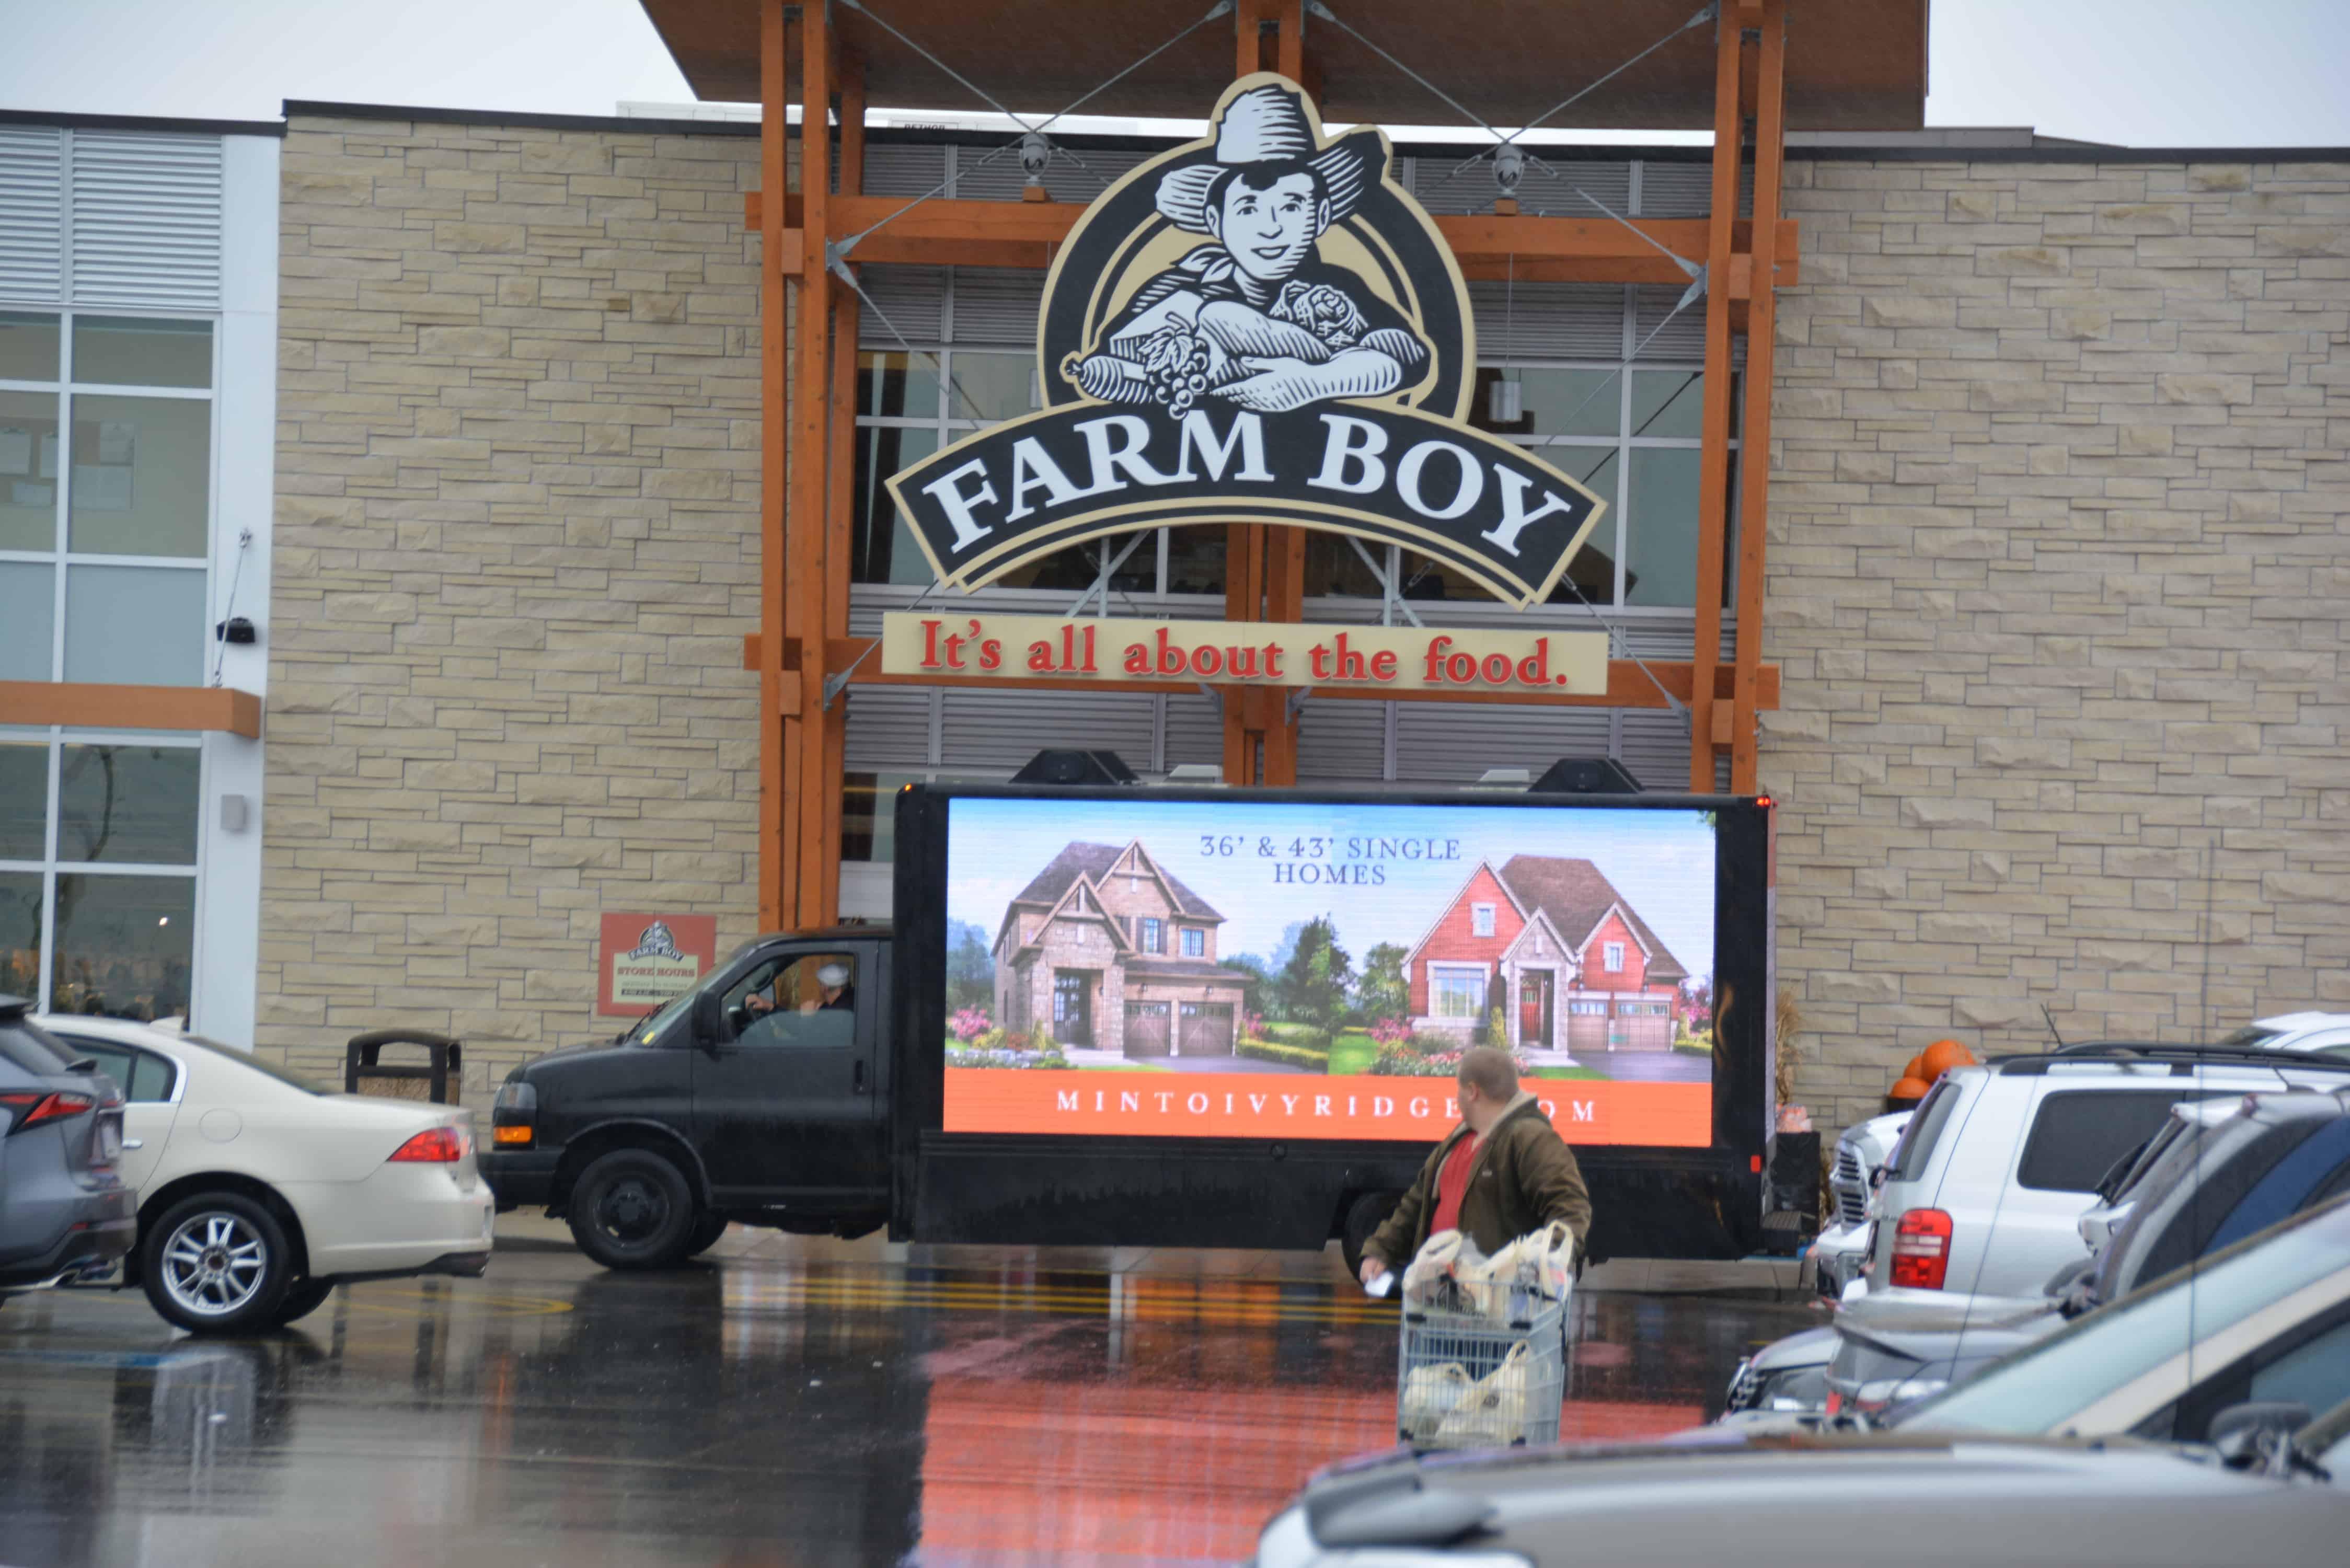 LED Billboards for truck ads